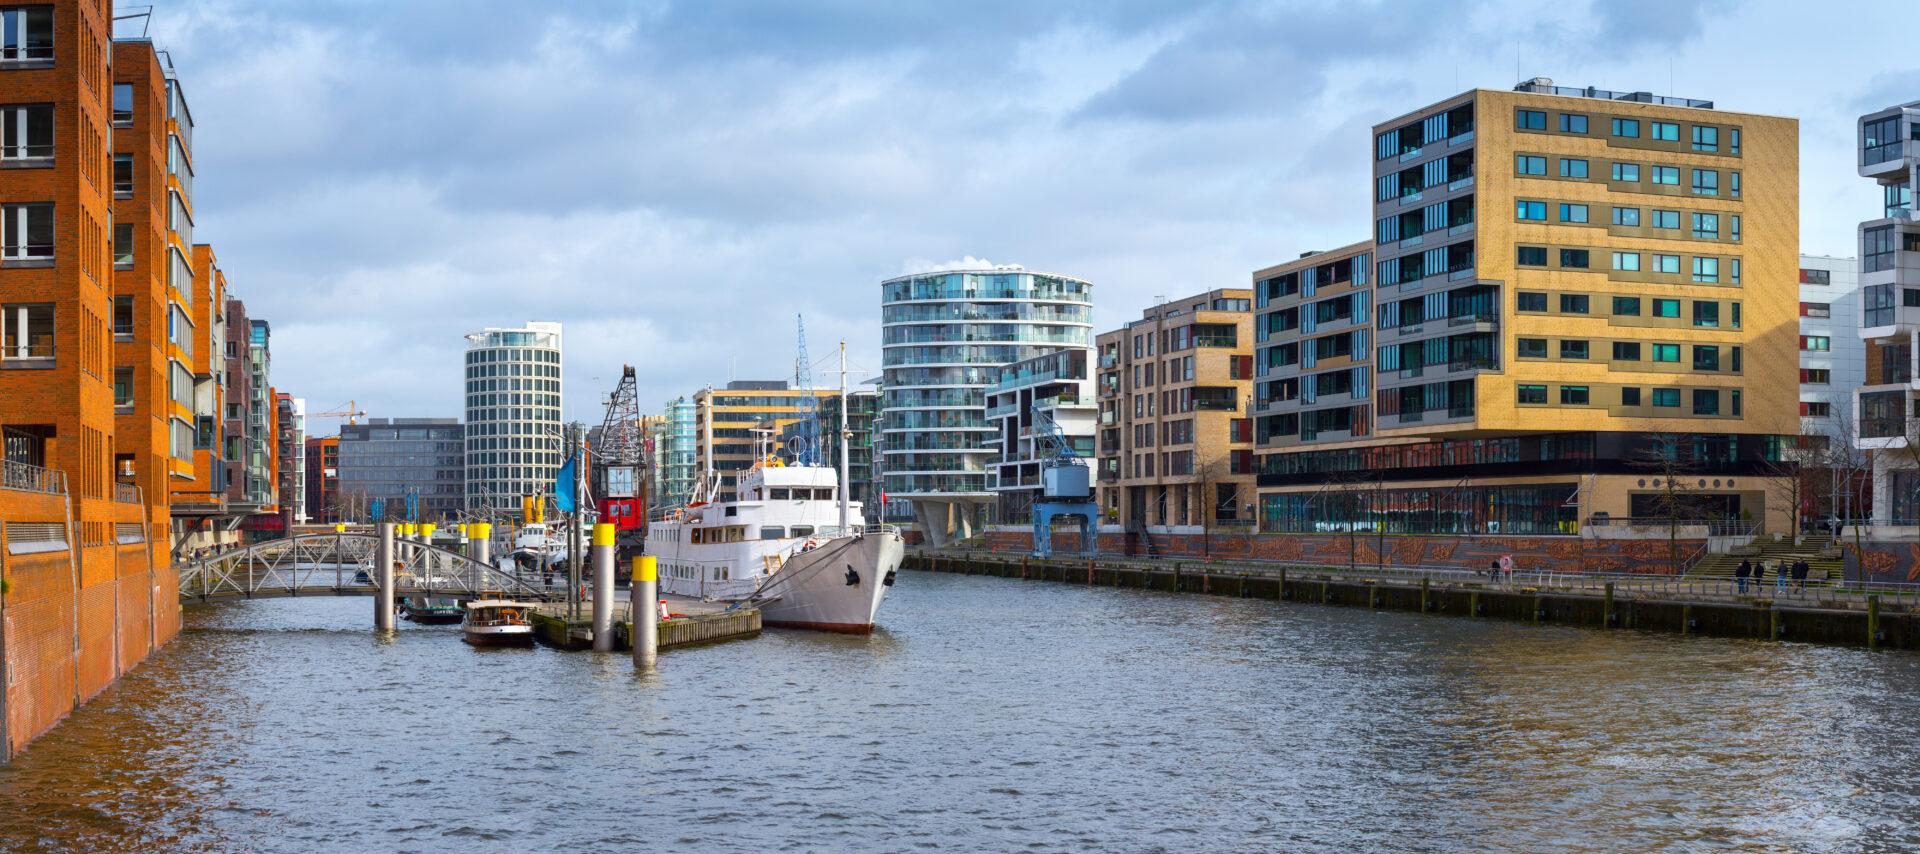 Virtuelle Geschäftsadresse mieten Hamburger Hafencity